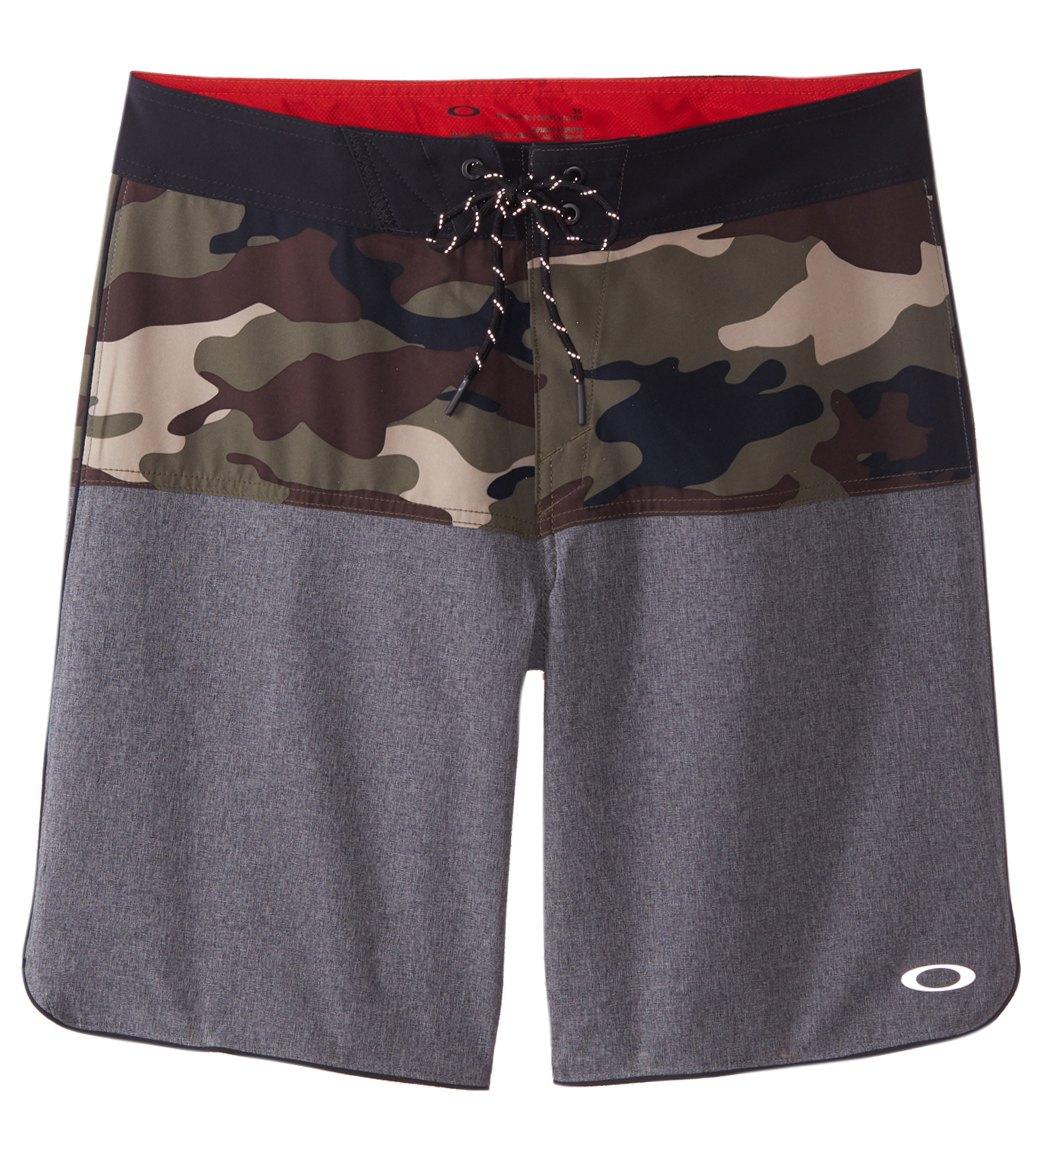 Camo Block Oakley 19u0022 Slim Boardshort Men's Fit PZukXiOT